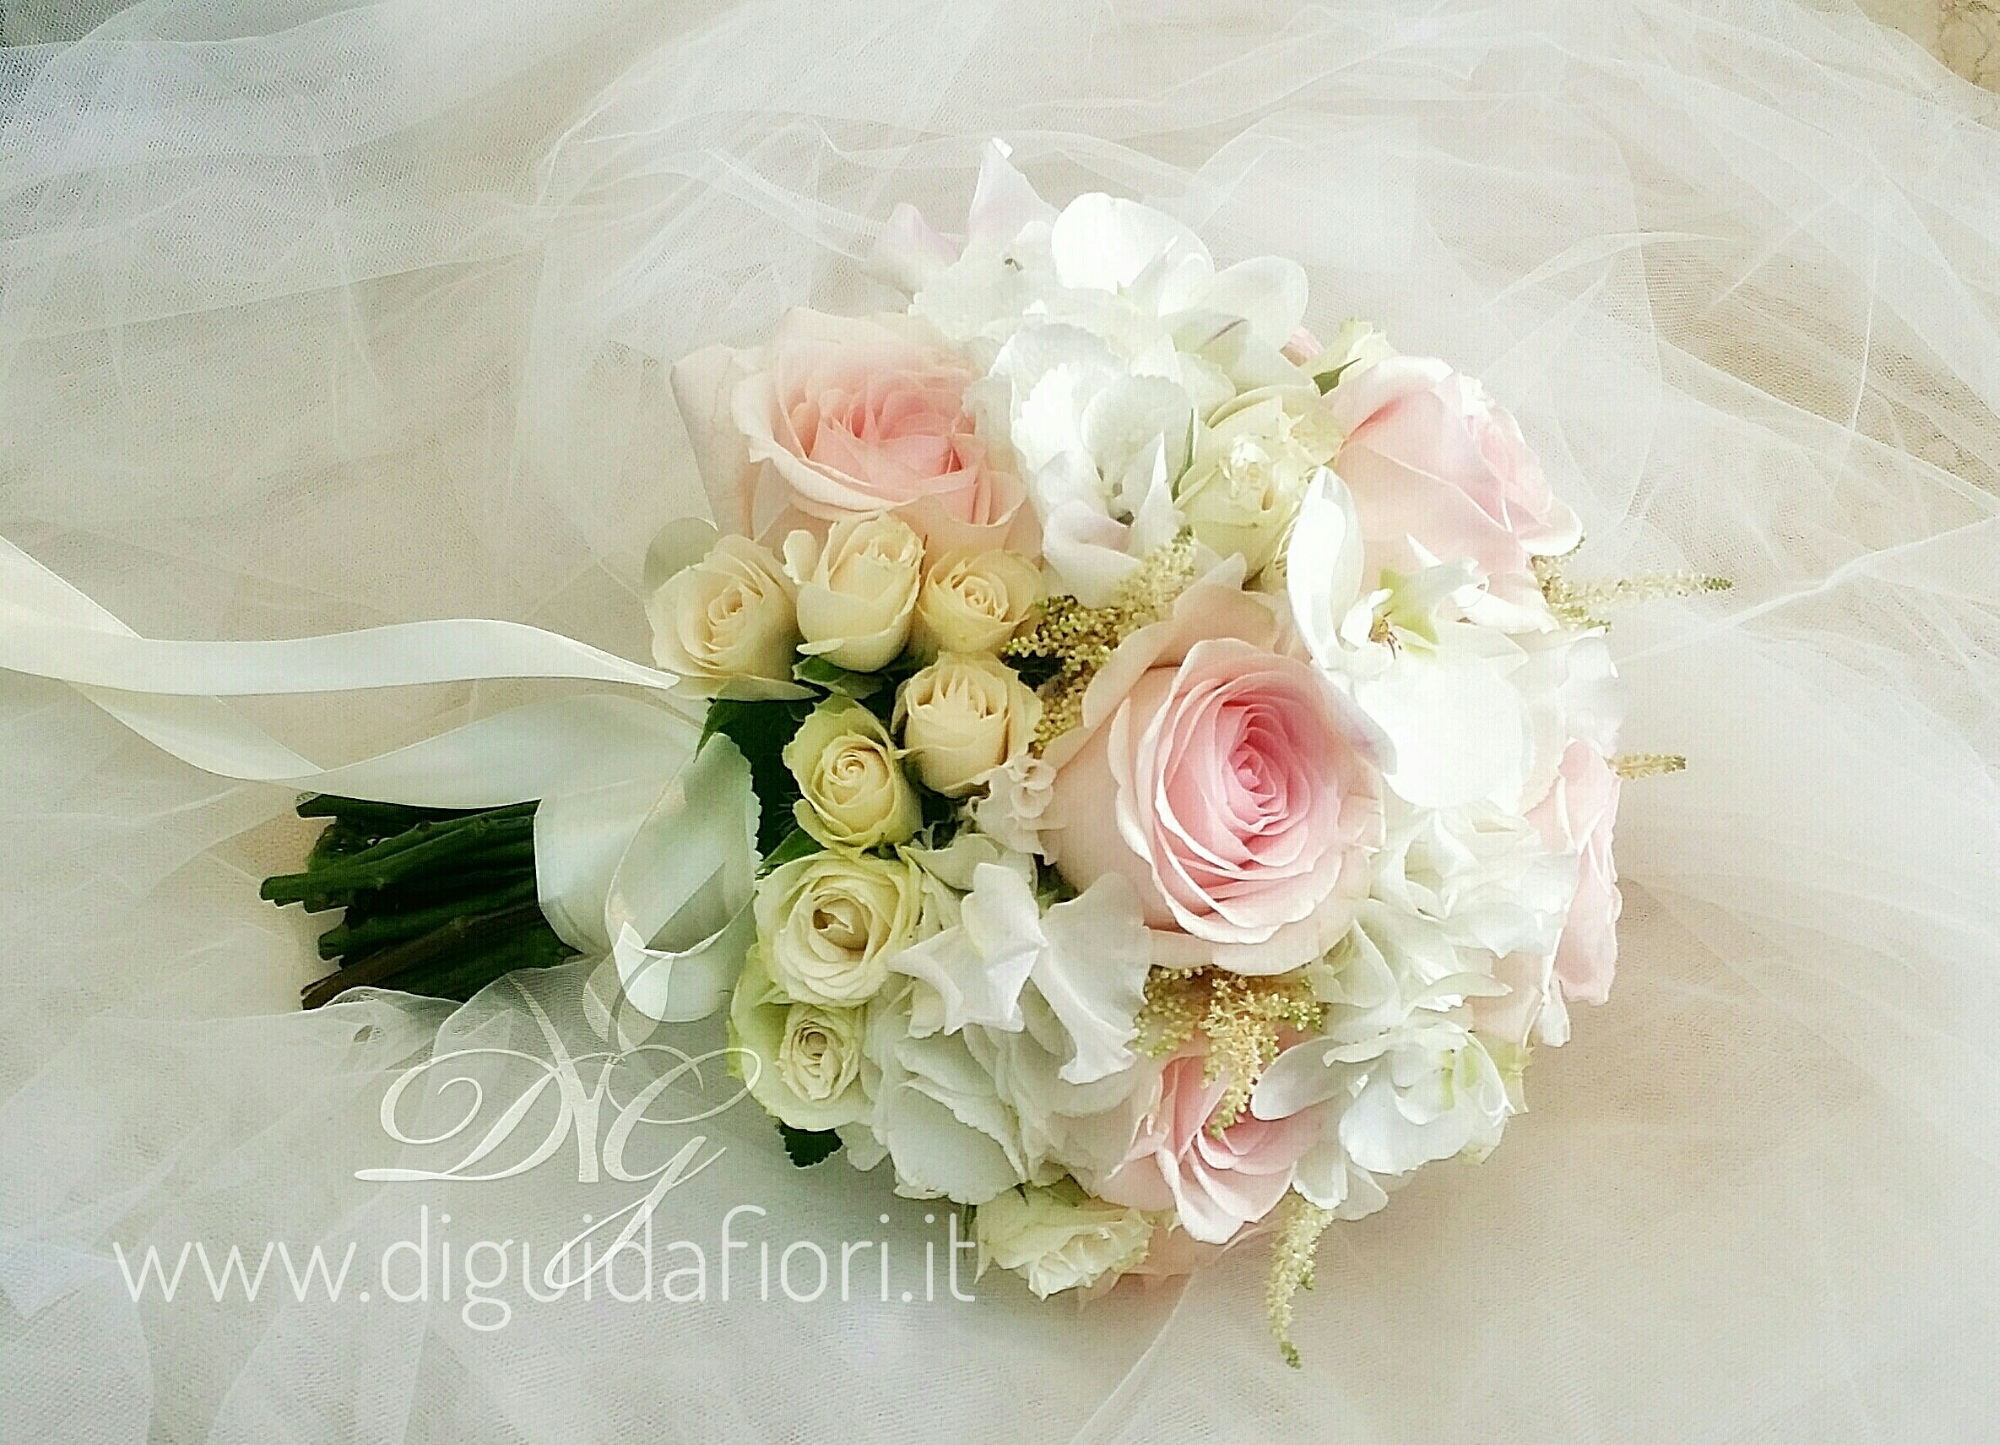 Bouquet Ortensie E Rose : Bouquet da sposa elegante fiorista roberto di guida